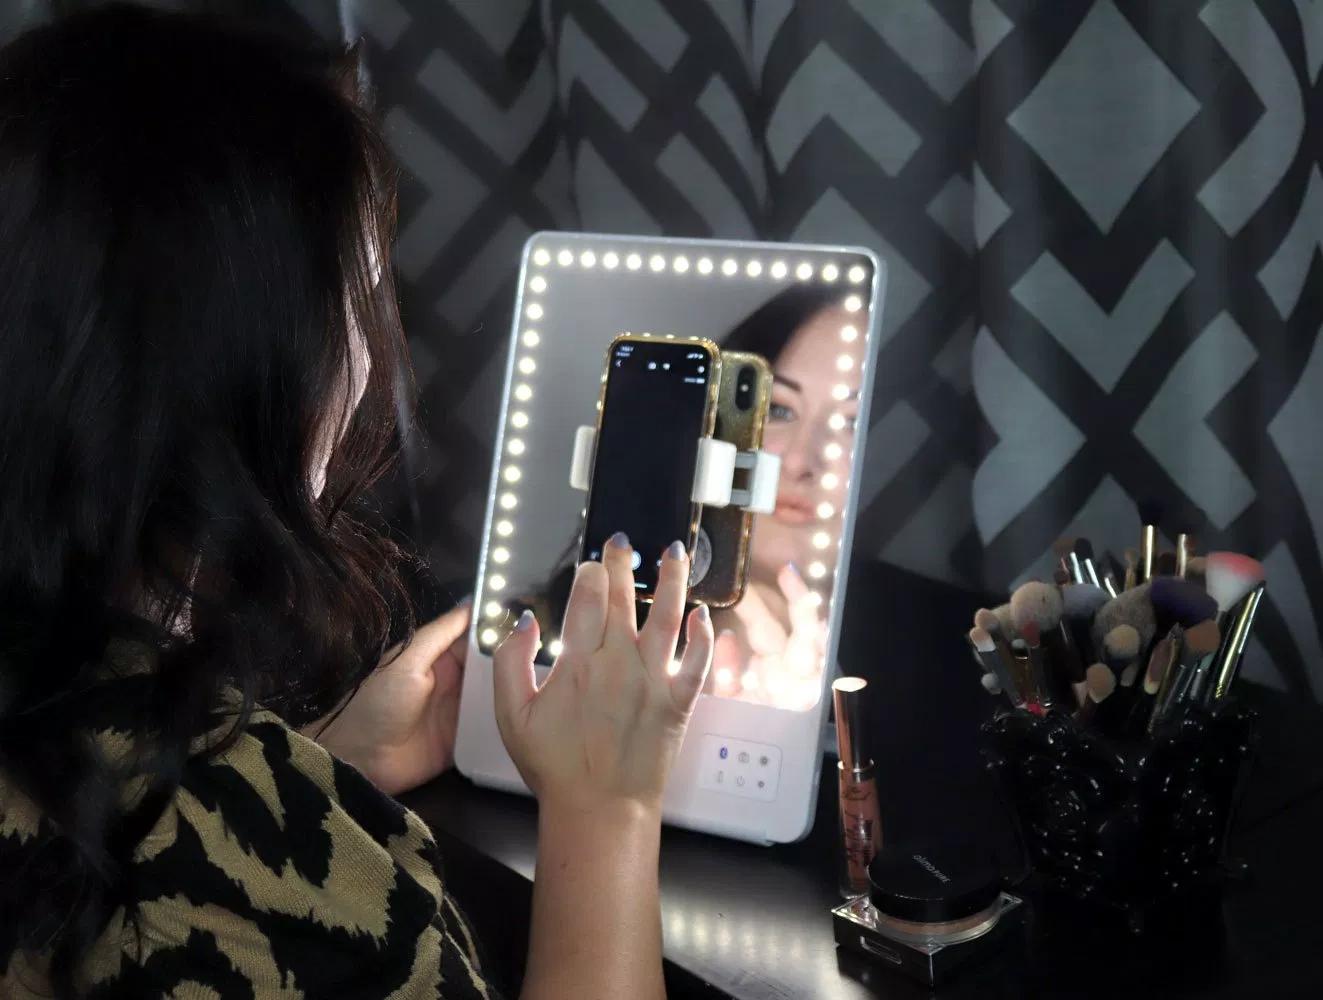 Glamcor Riki Skinny vs Riki Tall Lighted Selfie Mirrors